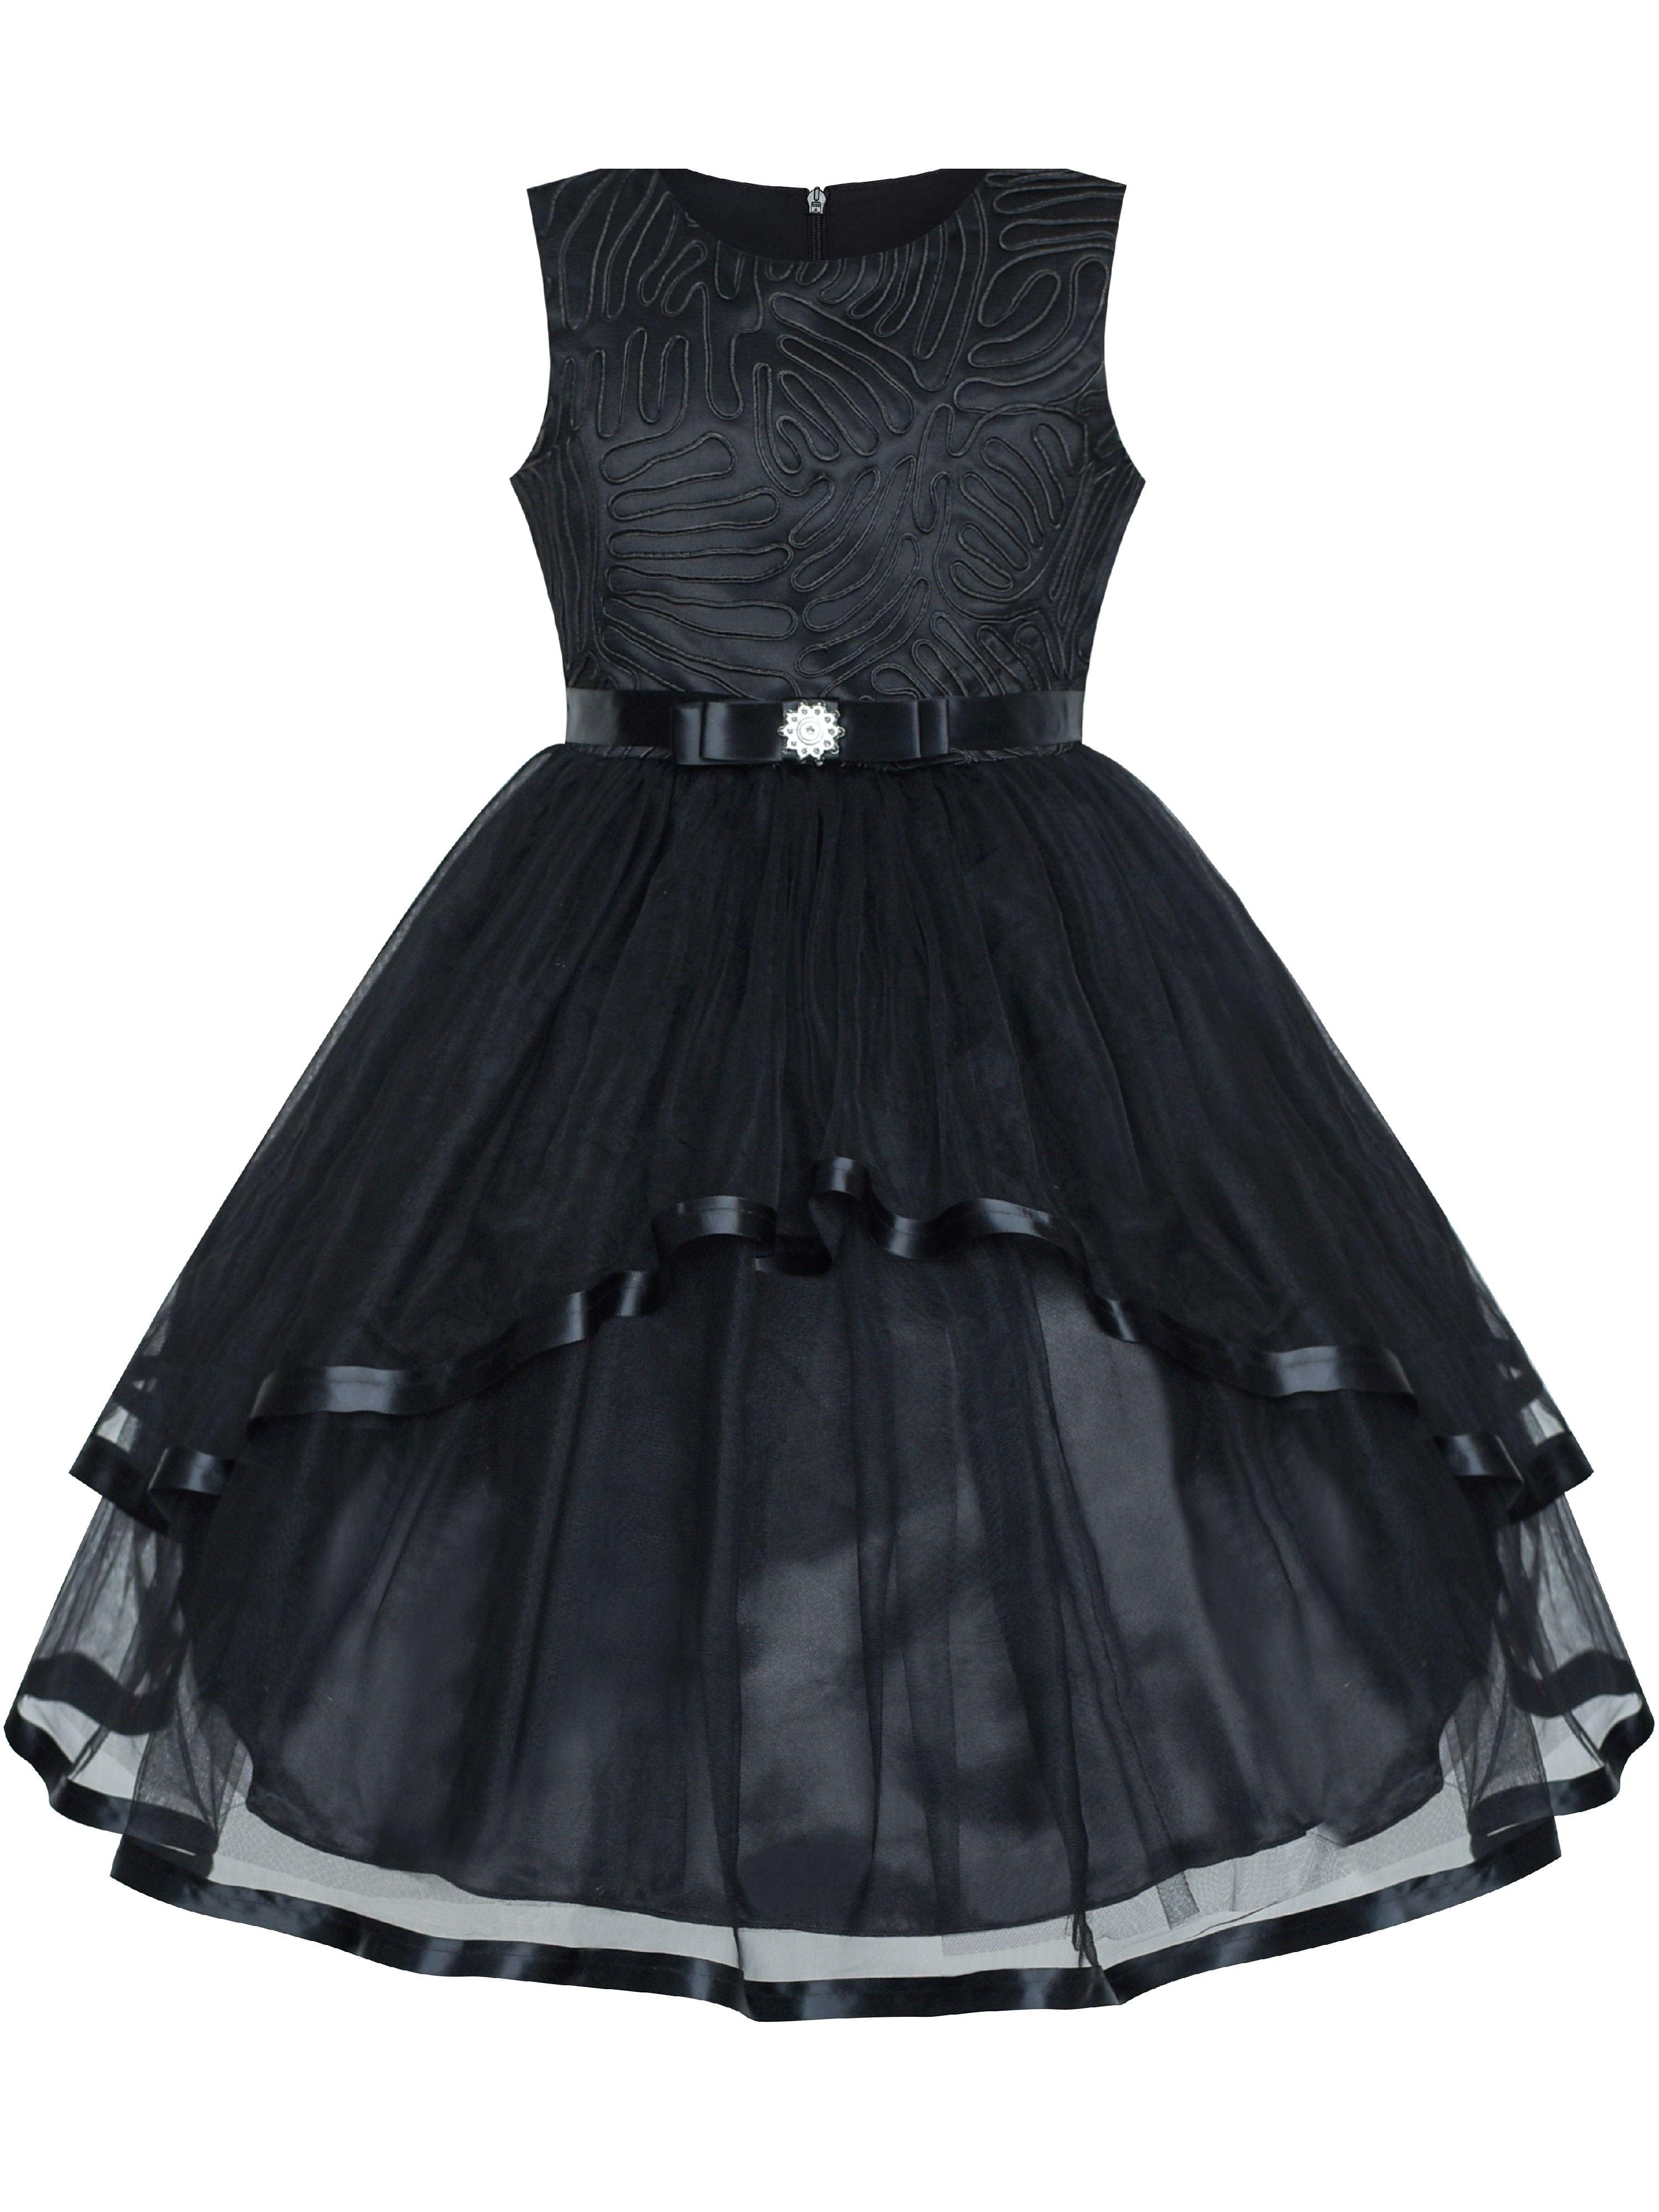 Flower Girl Dress Black Wedding Party